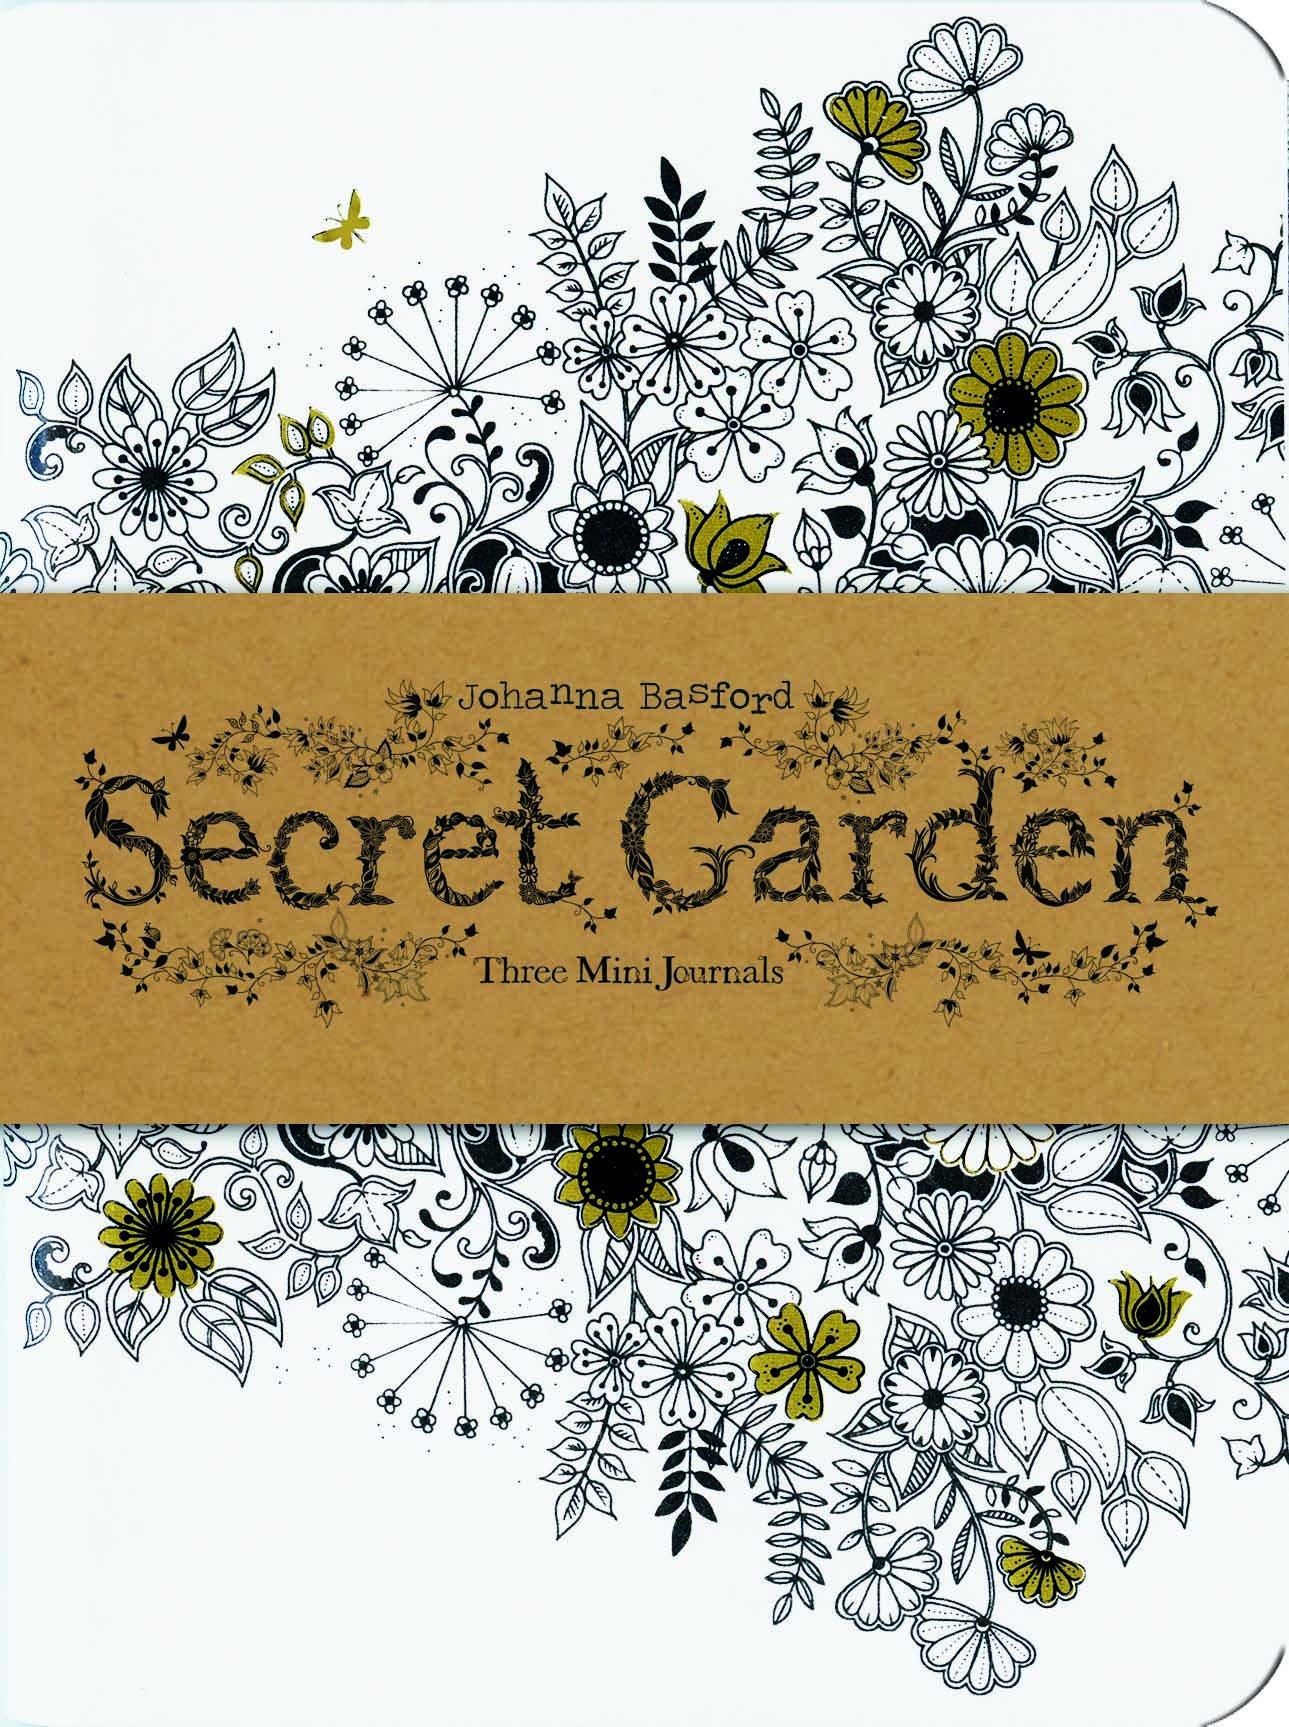 Amazon.com: Secret Garden: Three Mini Journals (9781856699488 ...